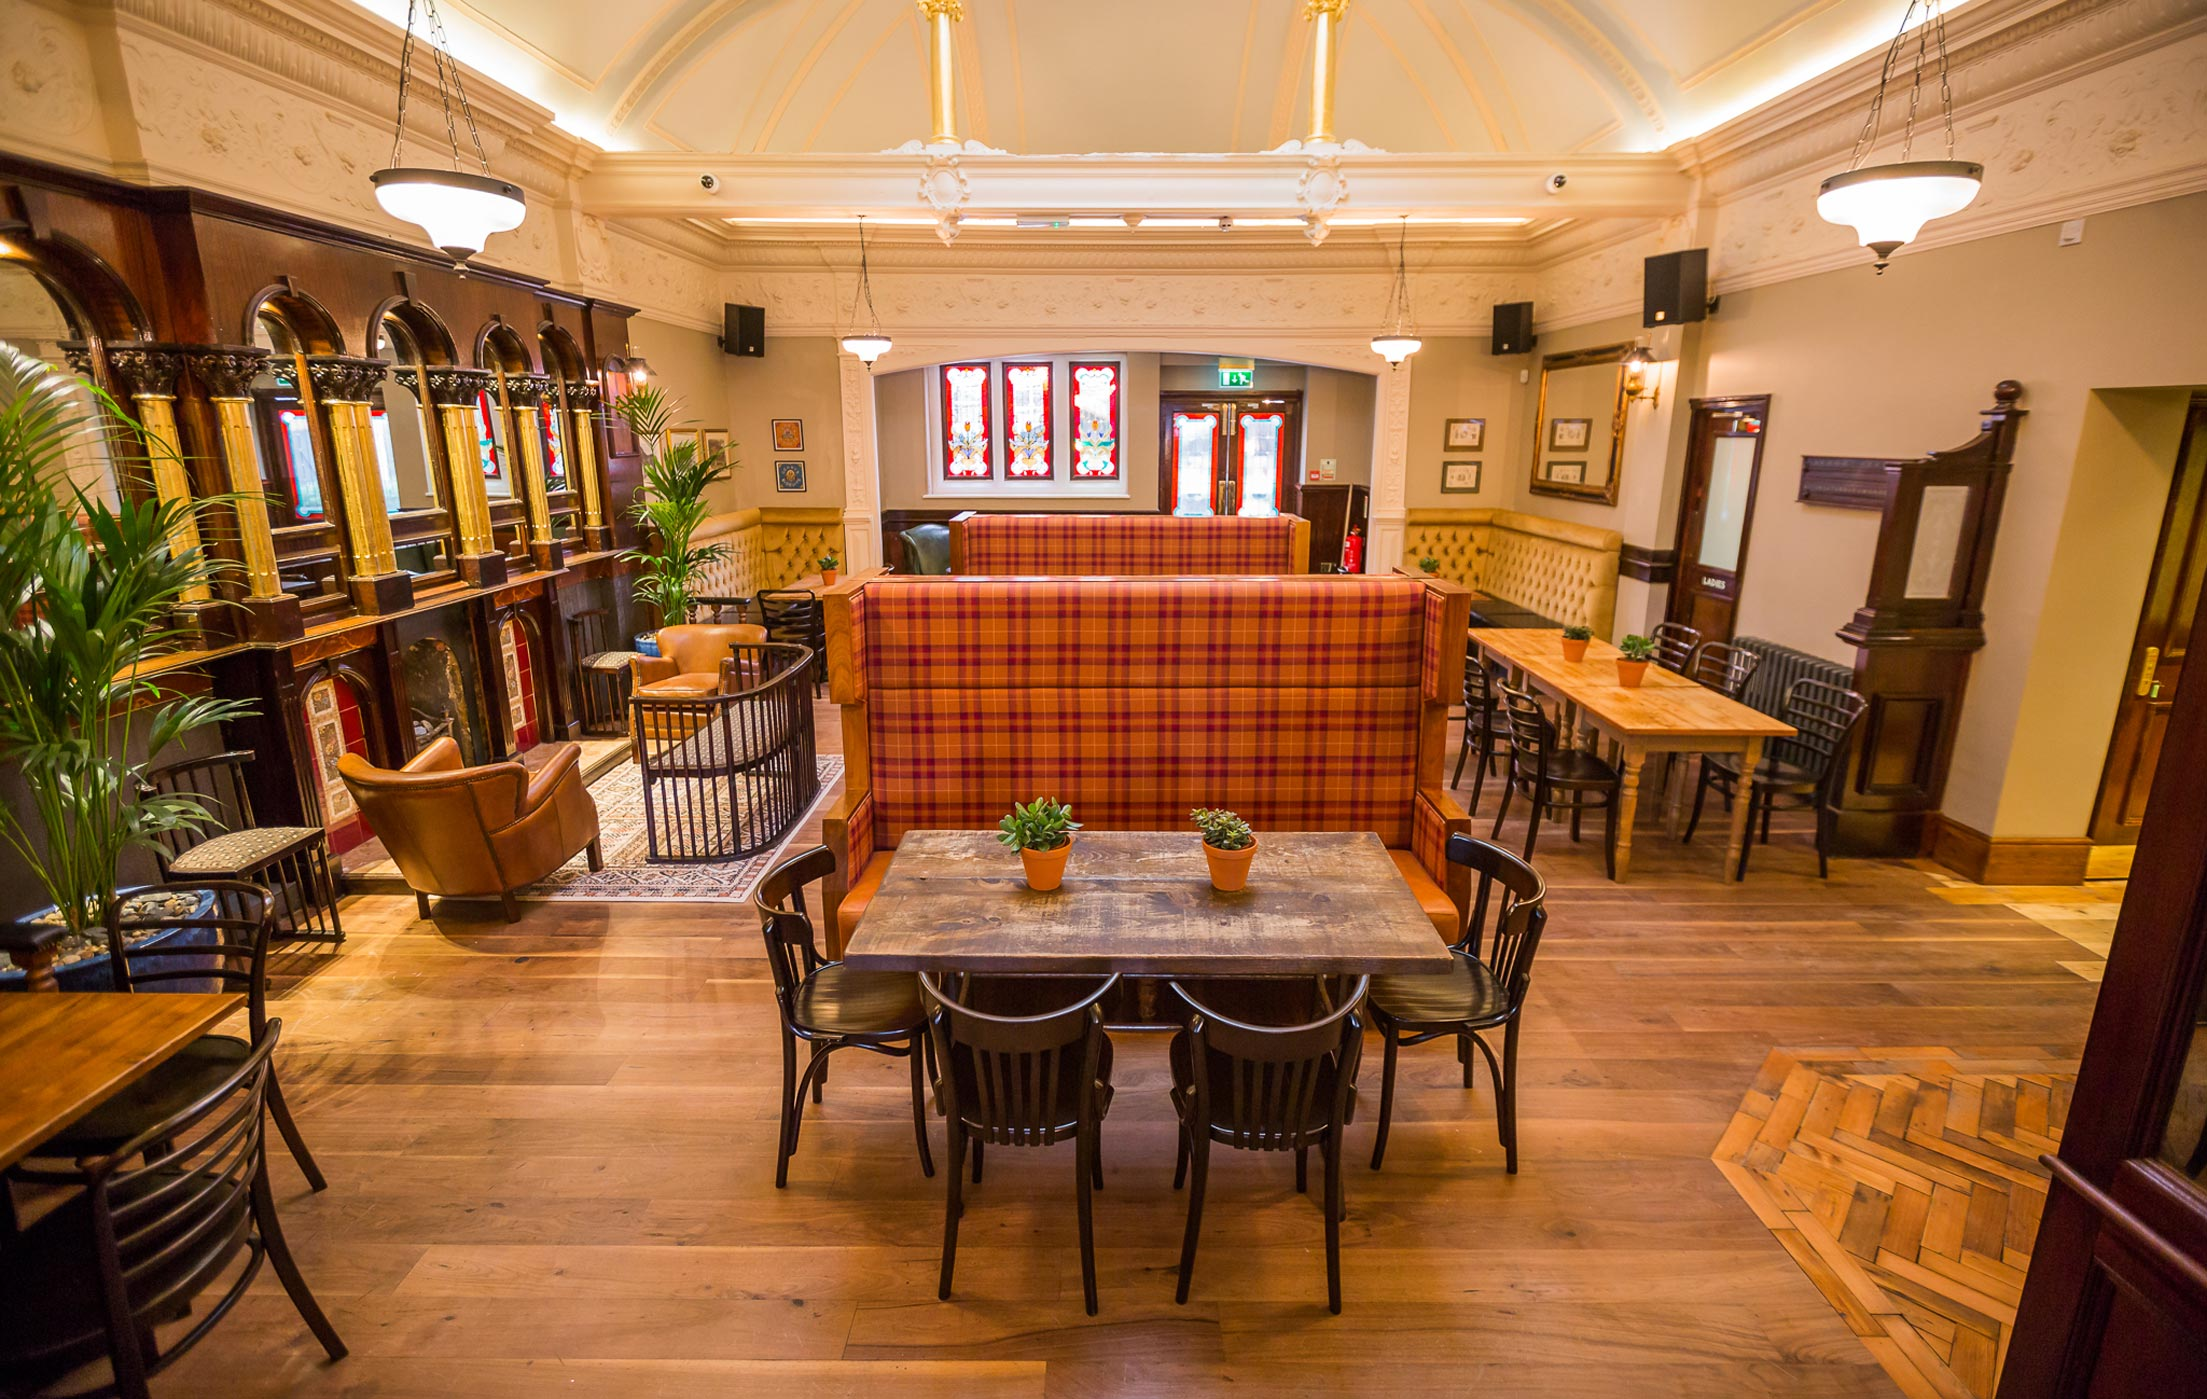 the-great-northern-railway-tavern-60.jpg